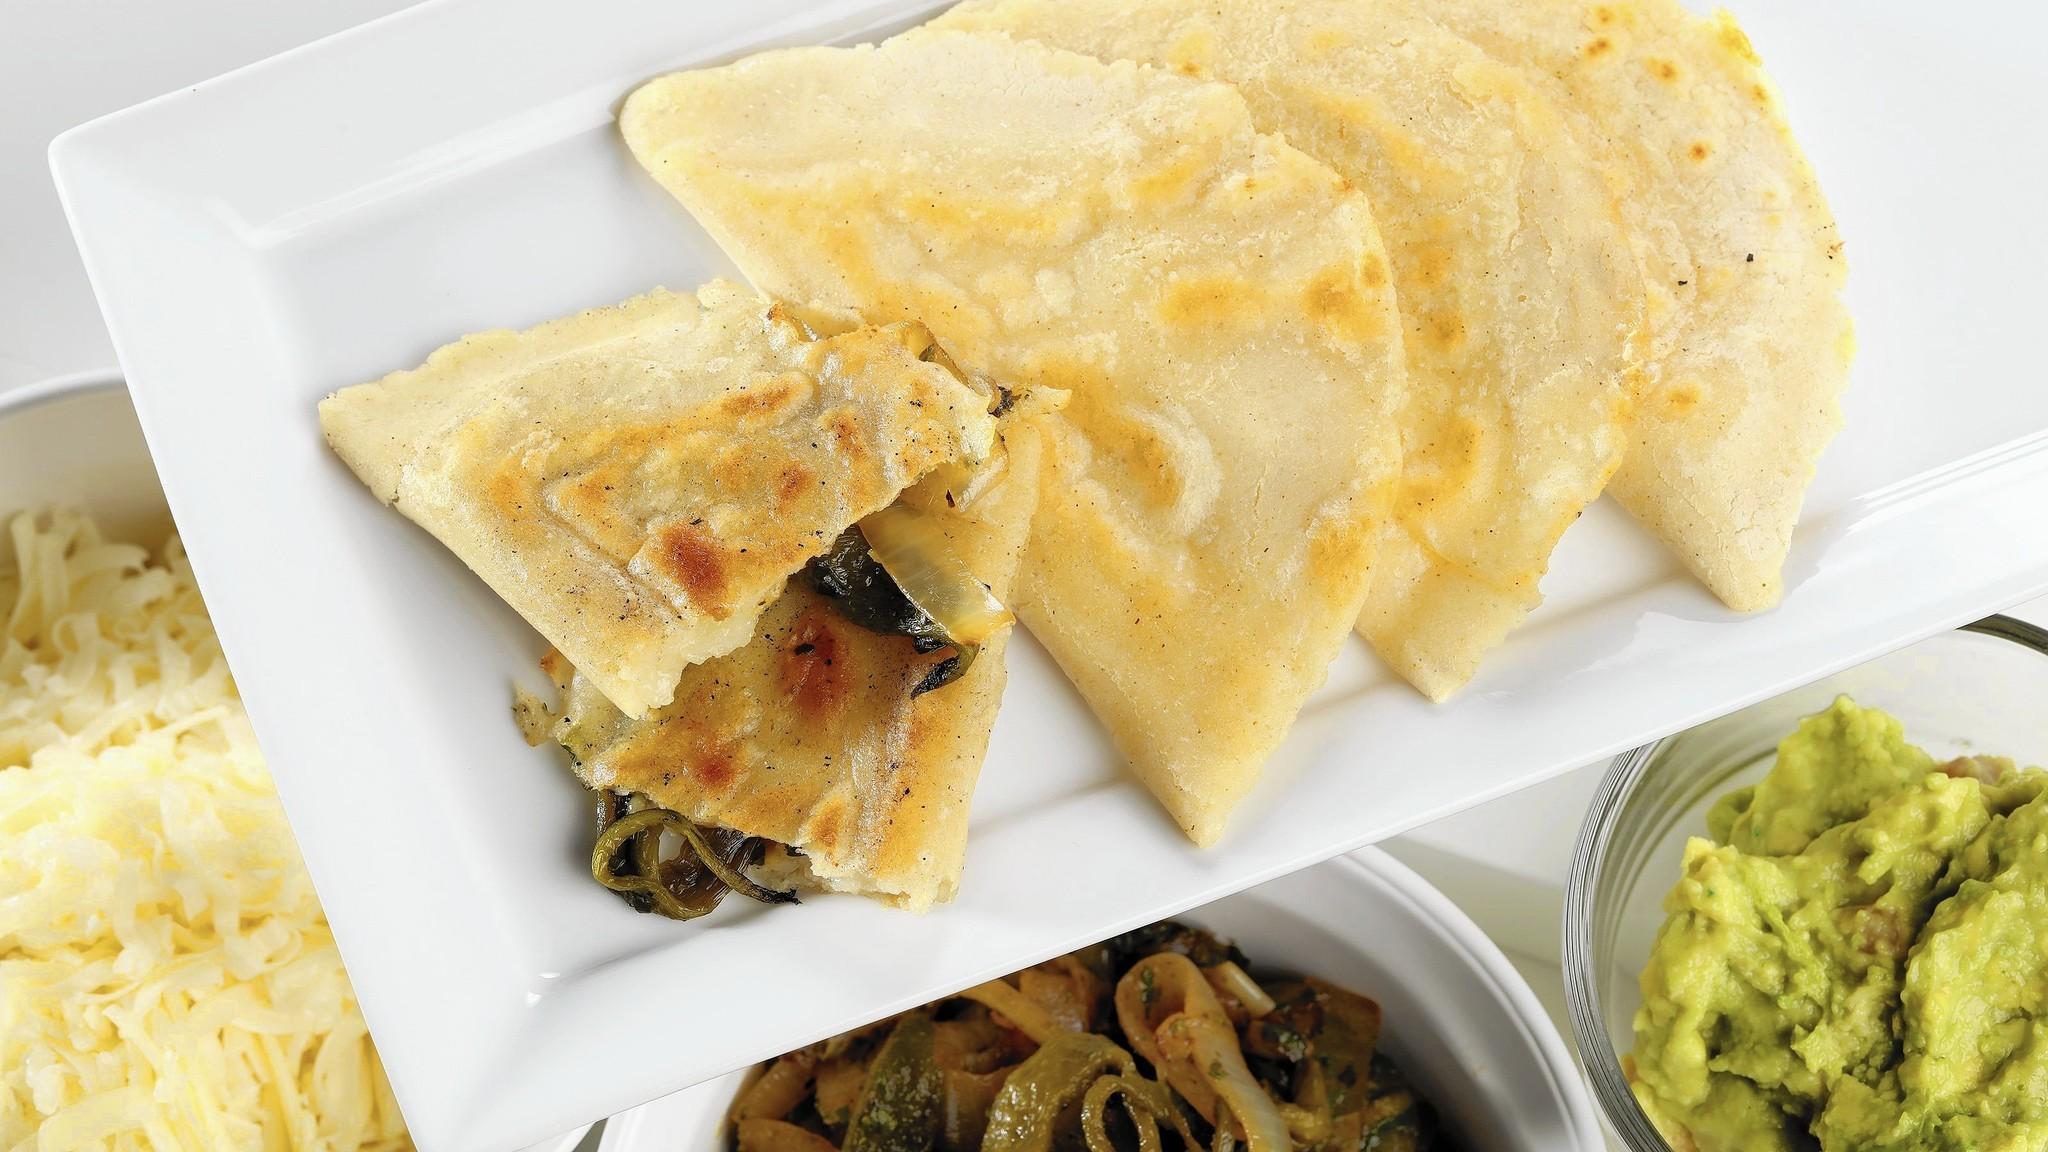 Fresh masa dough or pre-made tortilla, your quesadilla can be better